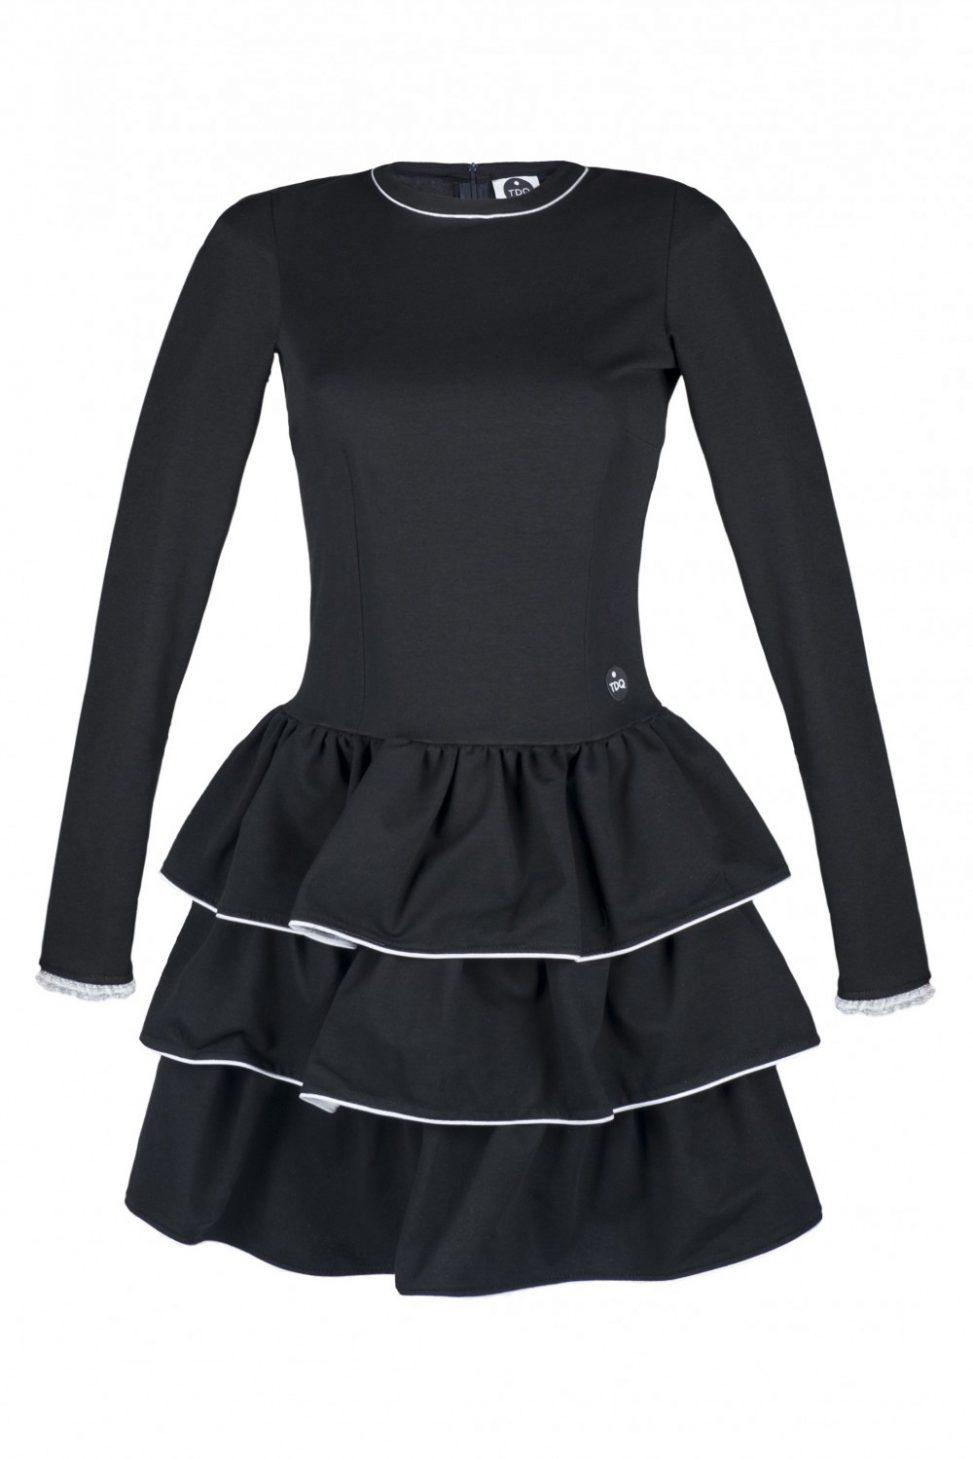 Czarna sukienka koktajlowa z falbankami